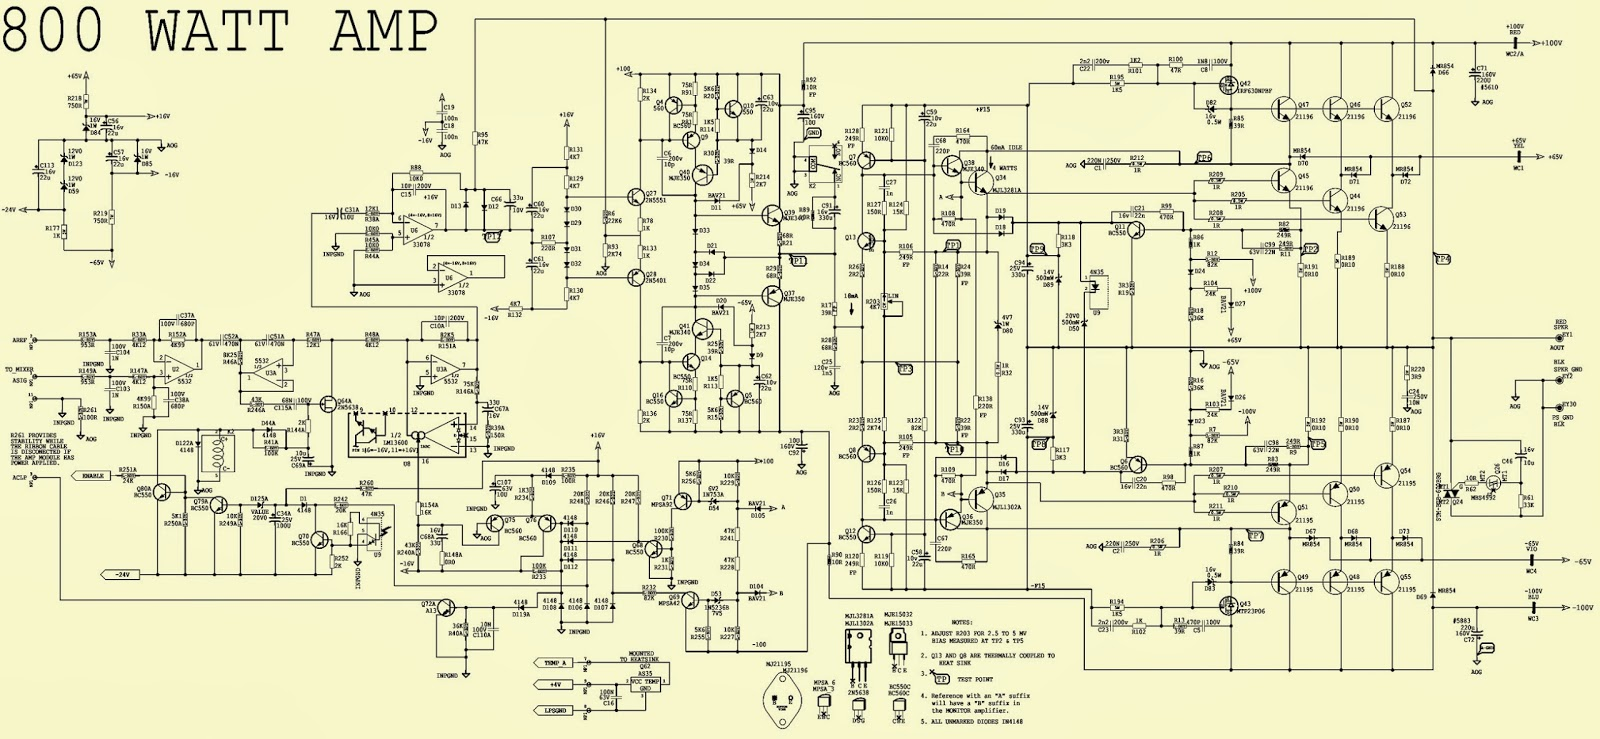 hight resolution of 800watts amplifier circuit diagram 800 watts amp 800watts amplifier circuit diagram